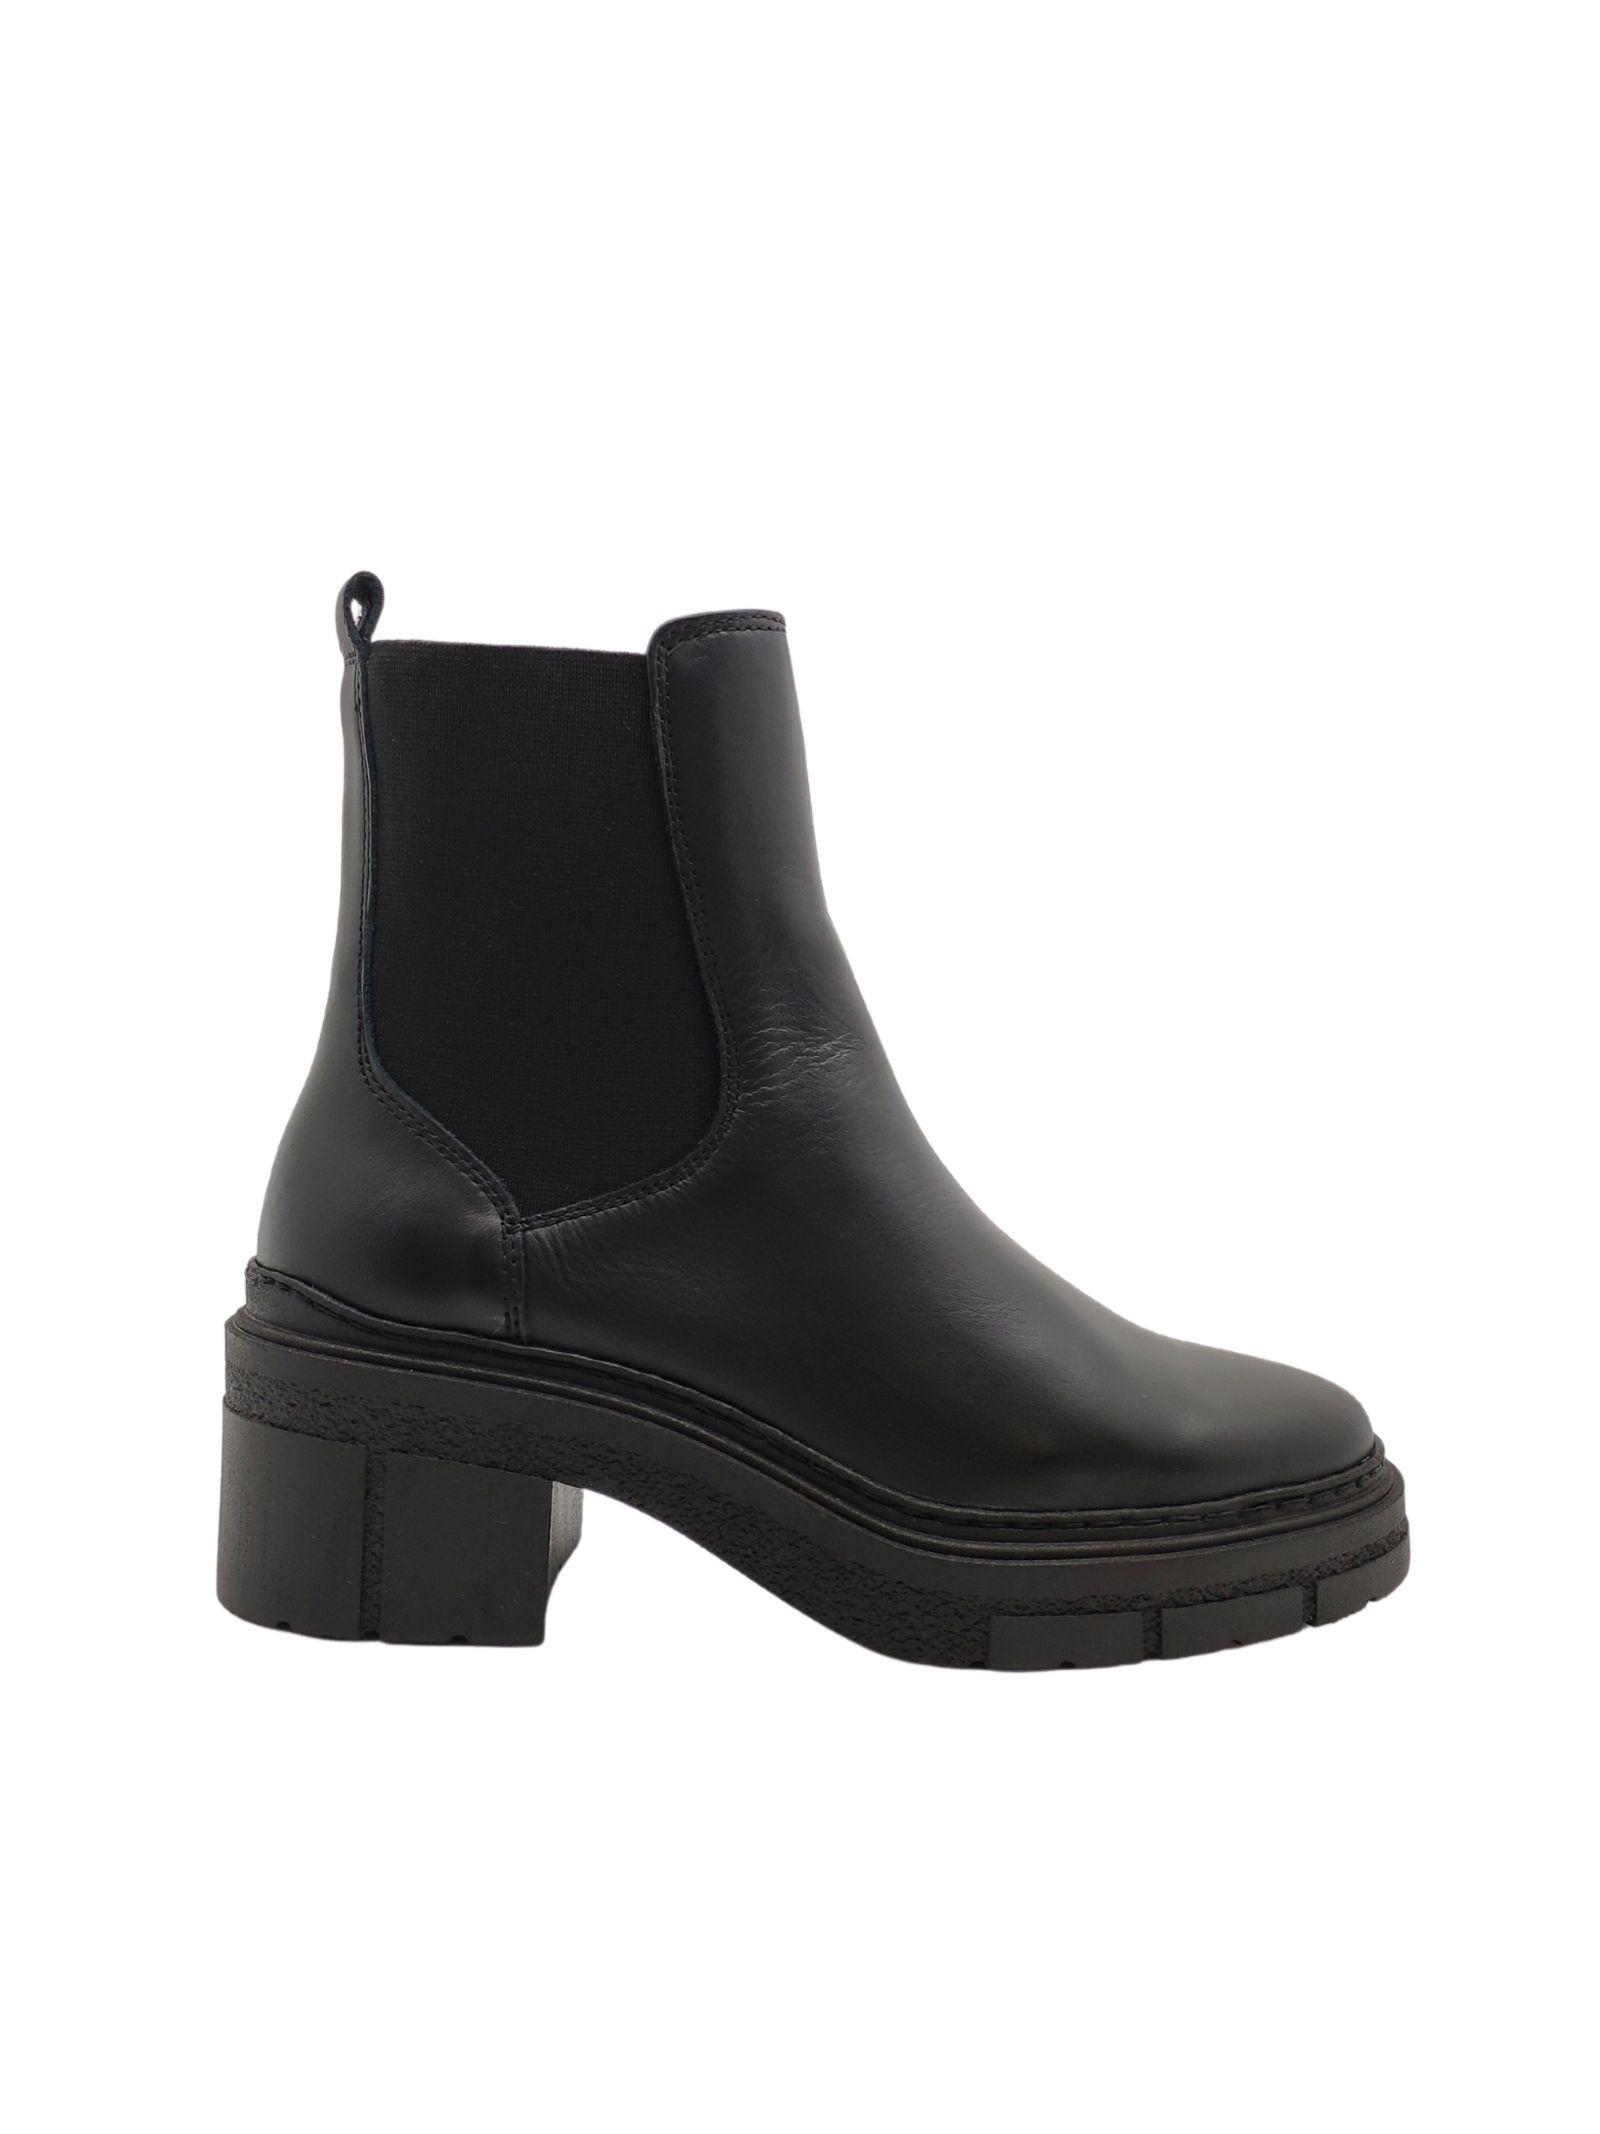 Women's Chelsea Boots Unisa | Ankle Boots | JIMENEZ_NFNERO